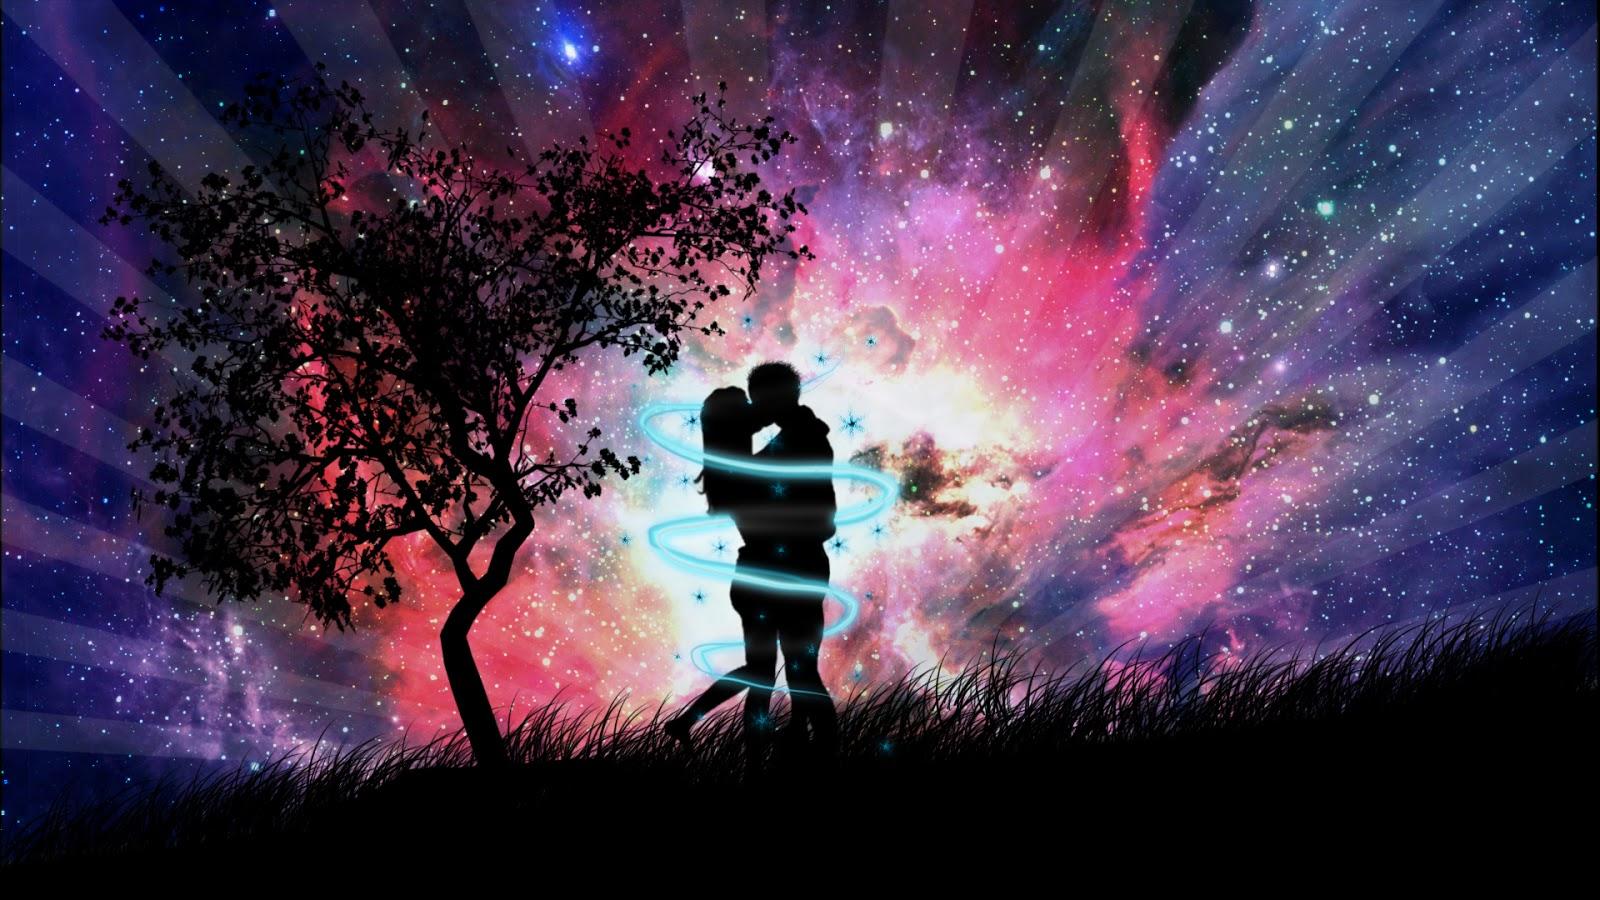 Free Animation Wallpaper 88: Love Wallpaper